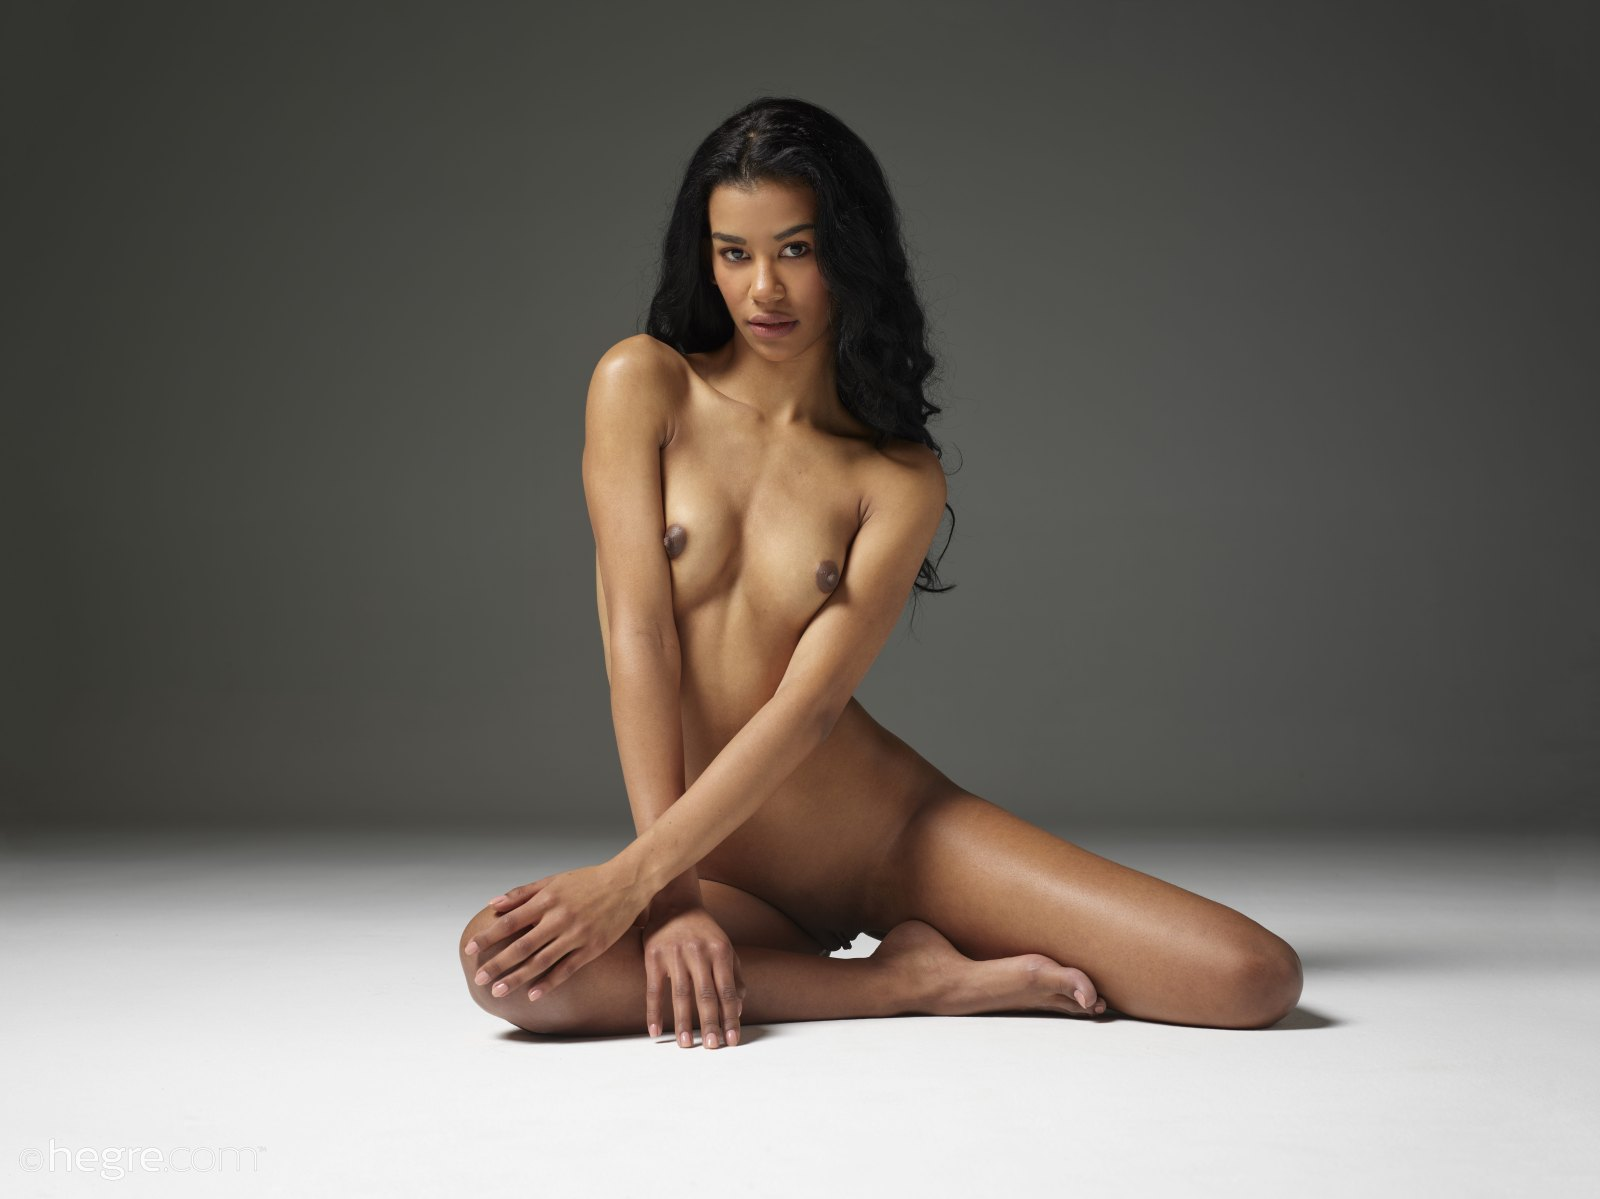 Ira nude in white lingerie